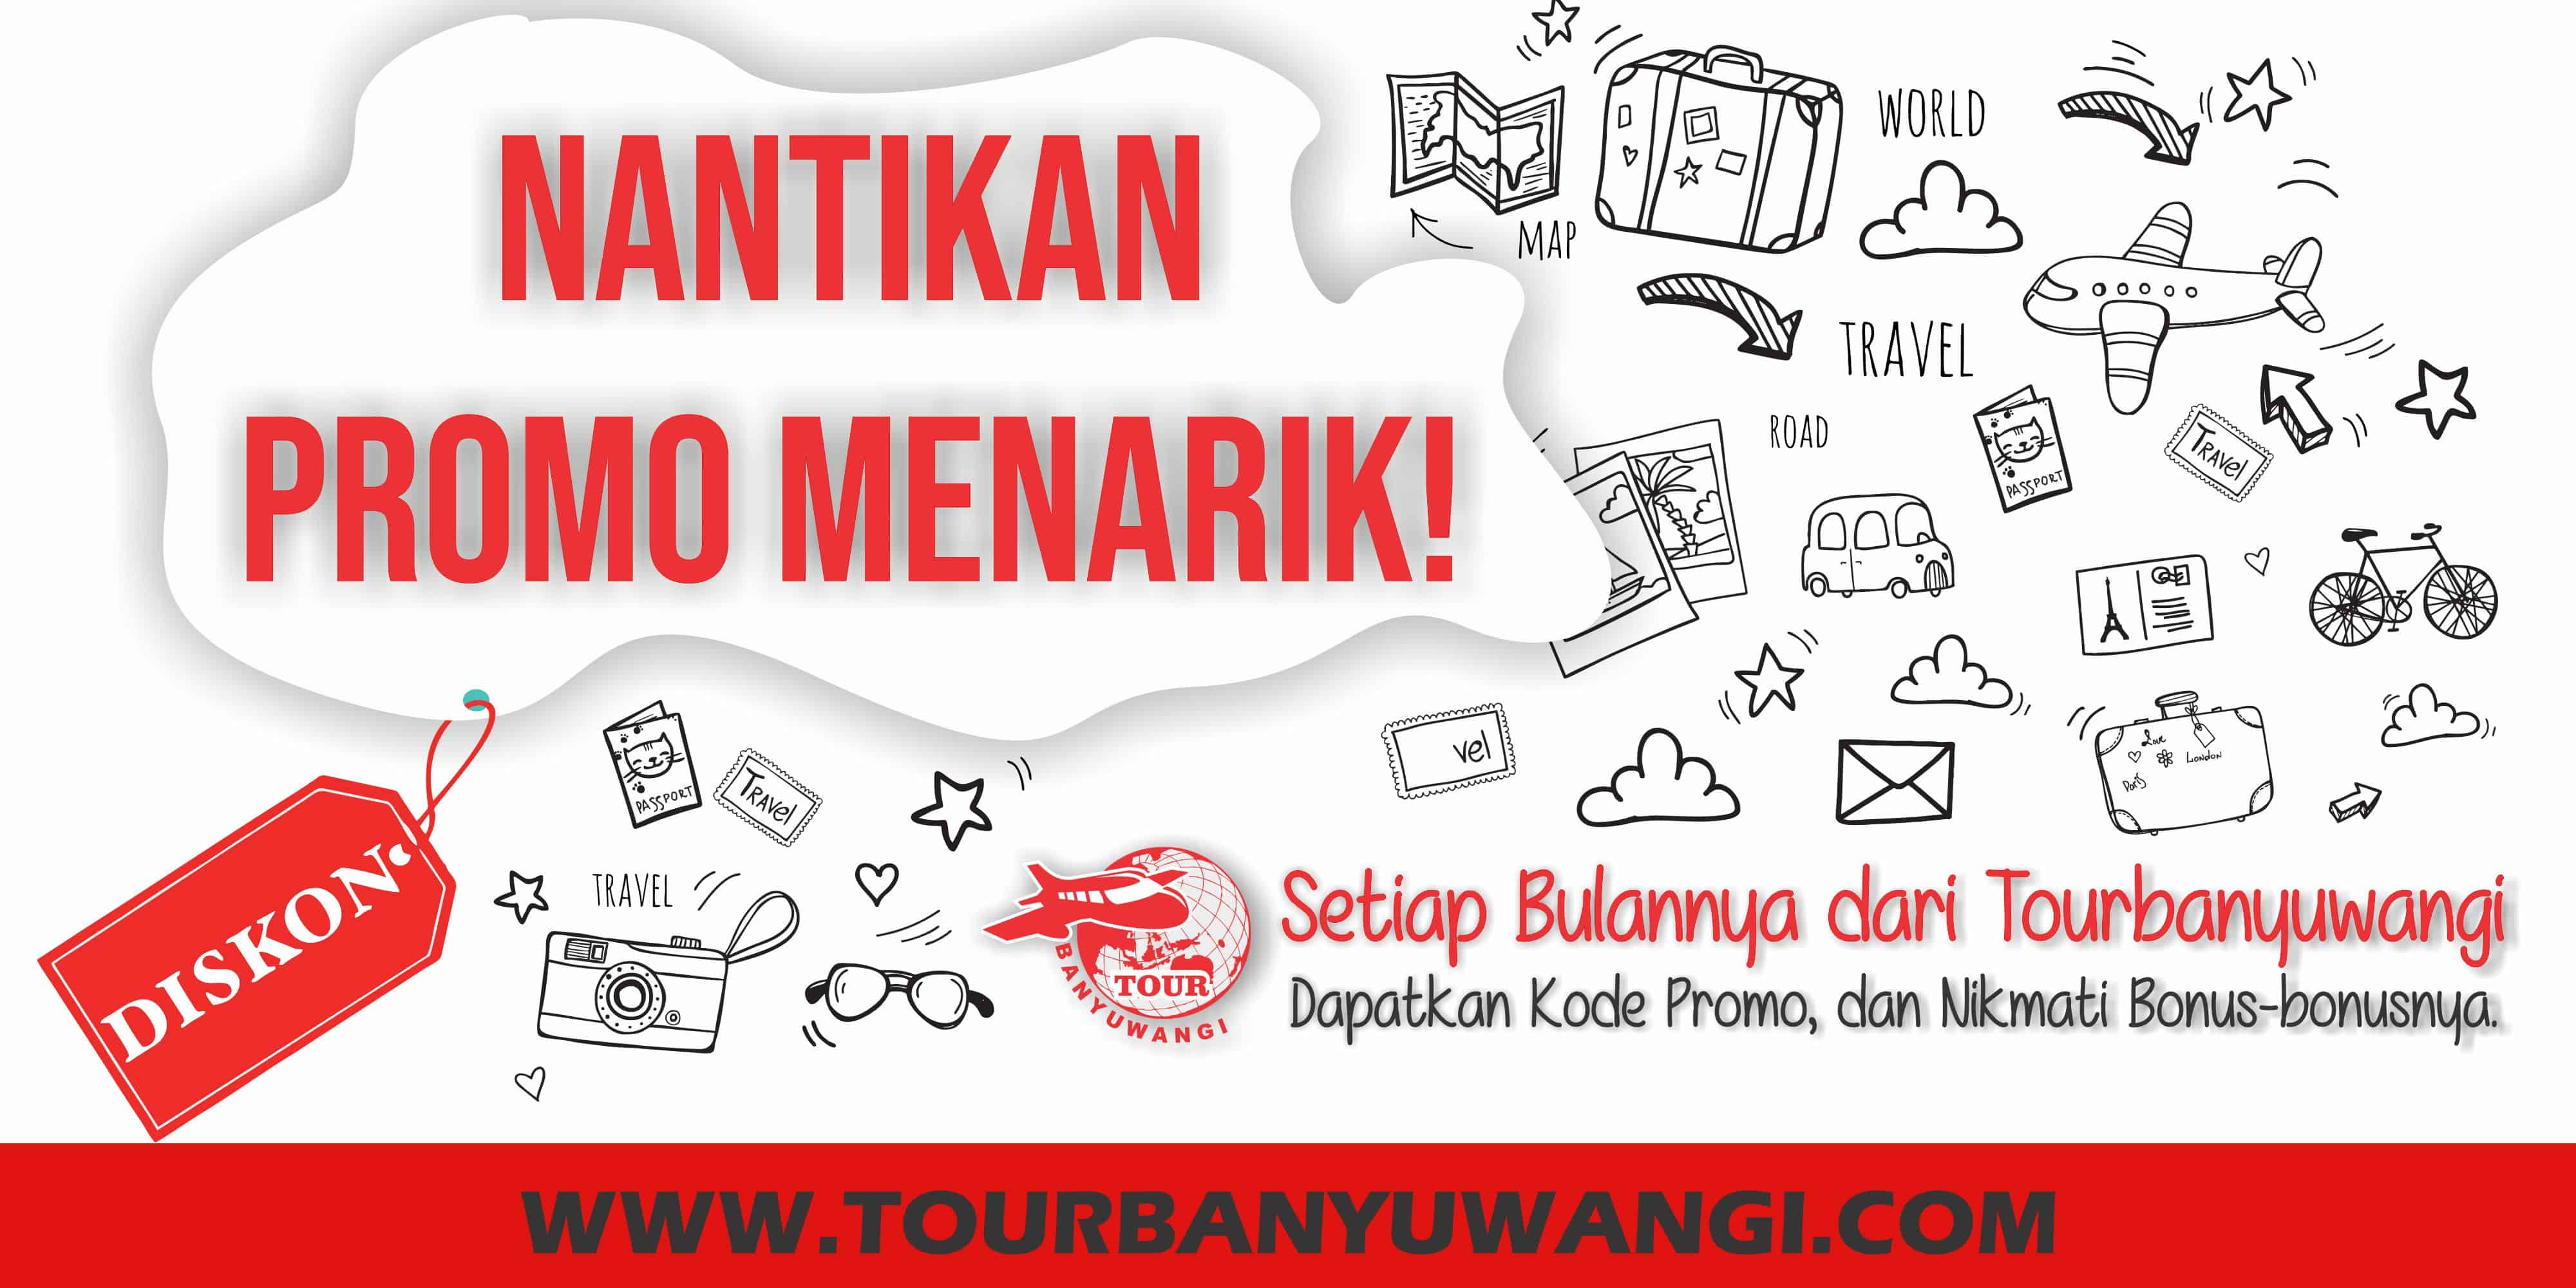 Paket Promo Tourbanyuwangi, Paket wisata banyuwangi, Paket wisata banyuwangi murah, www.tourbanyuwangi.com, 08113411712